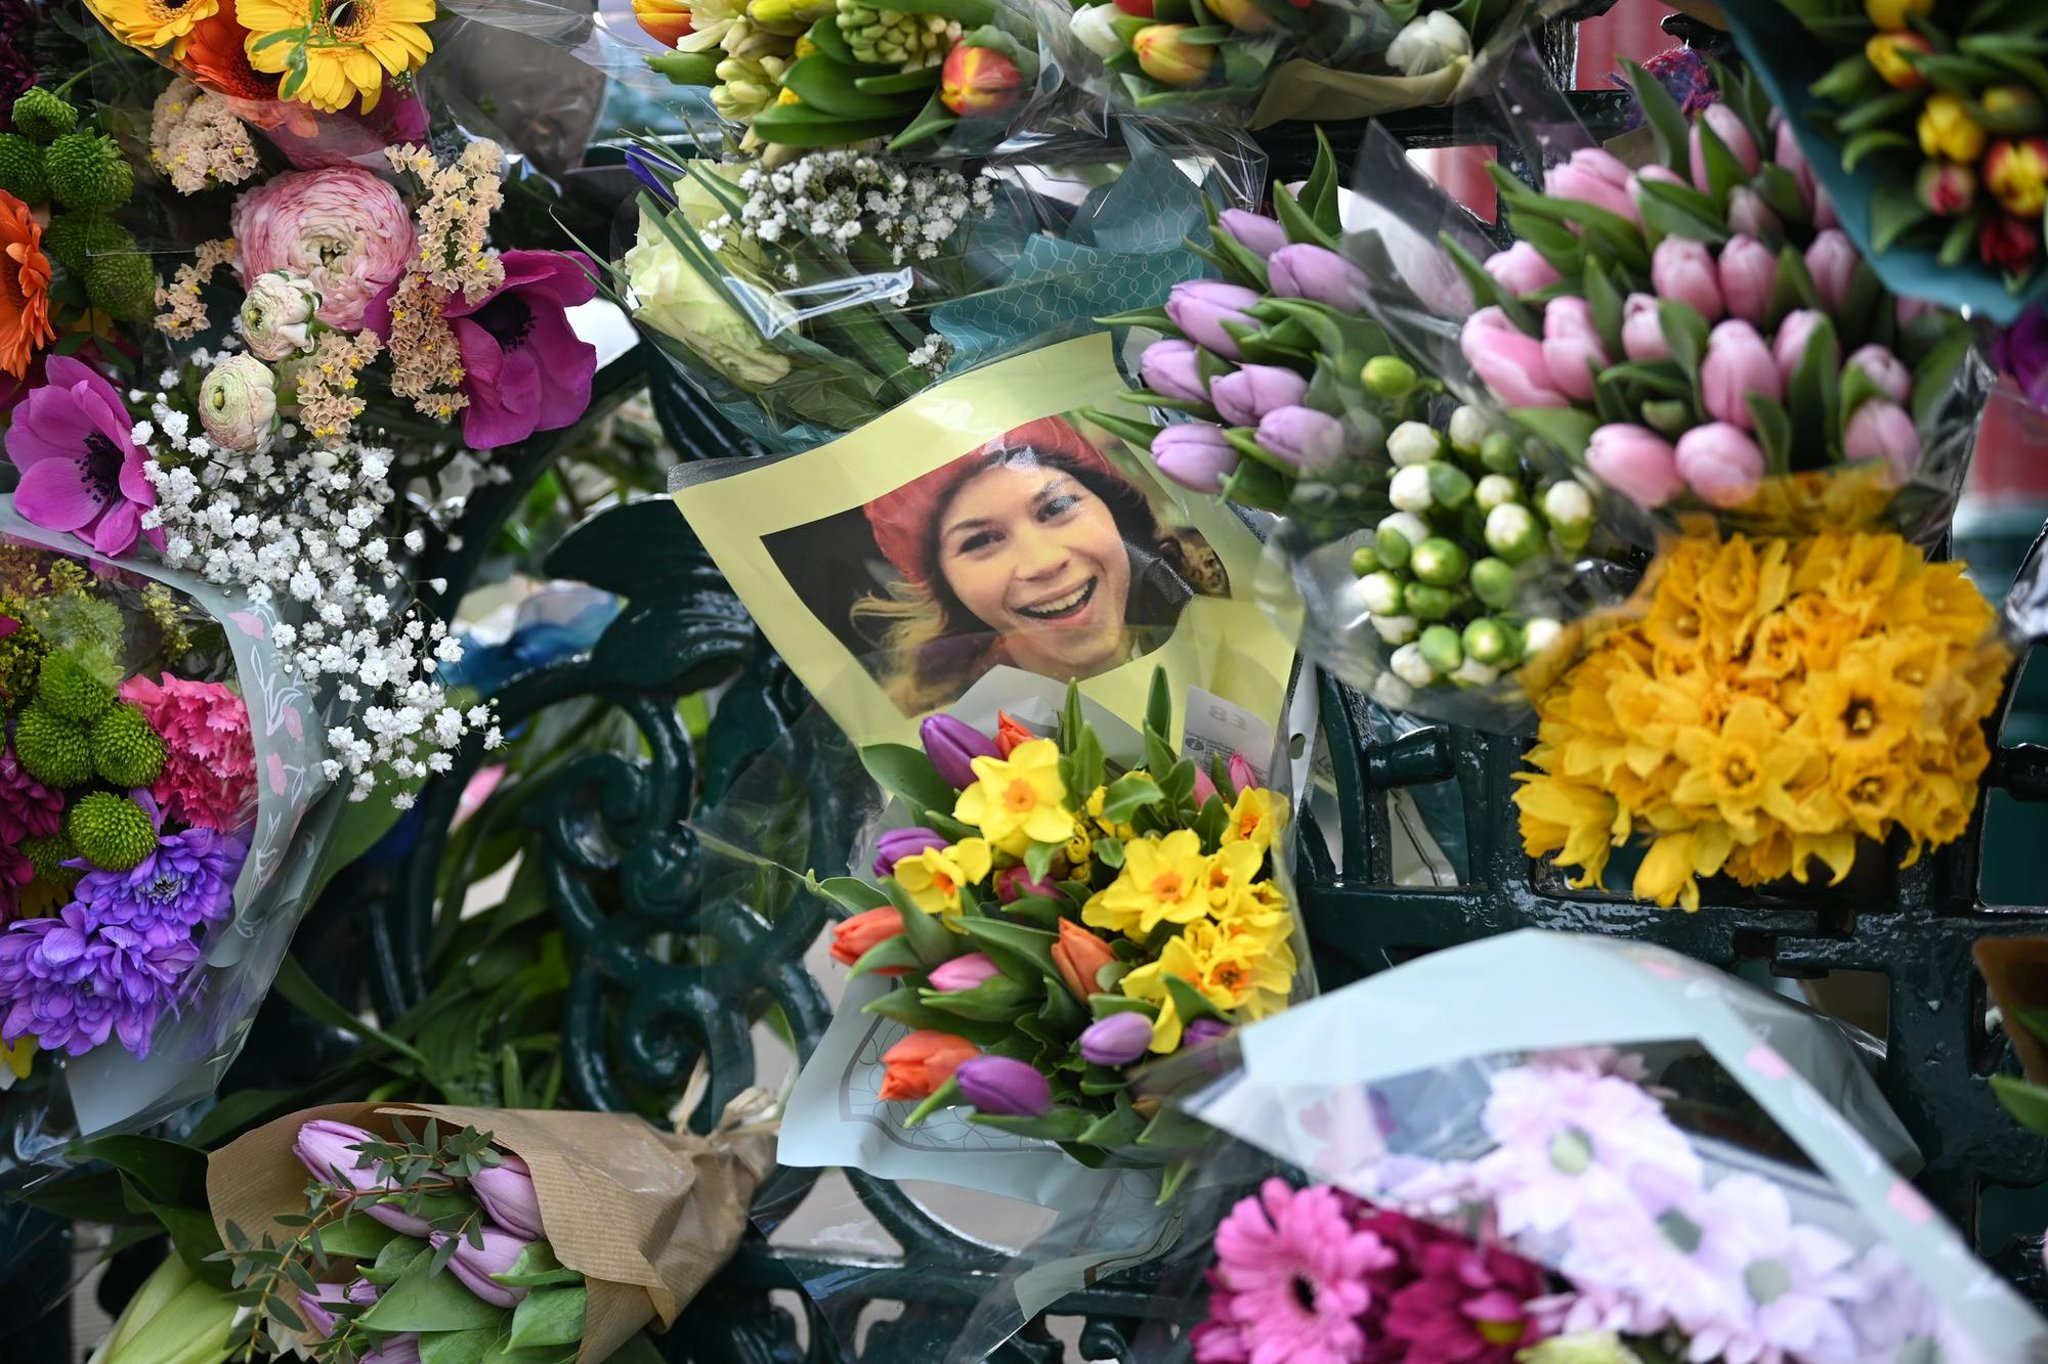 Sarah Everard's murder by a police officer demands major societal change –Scotsman comment